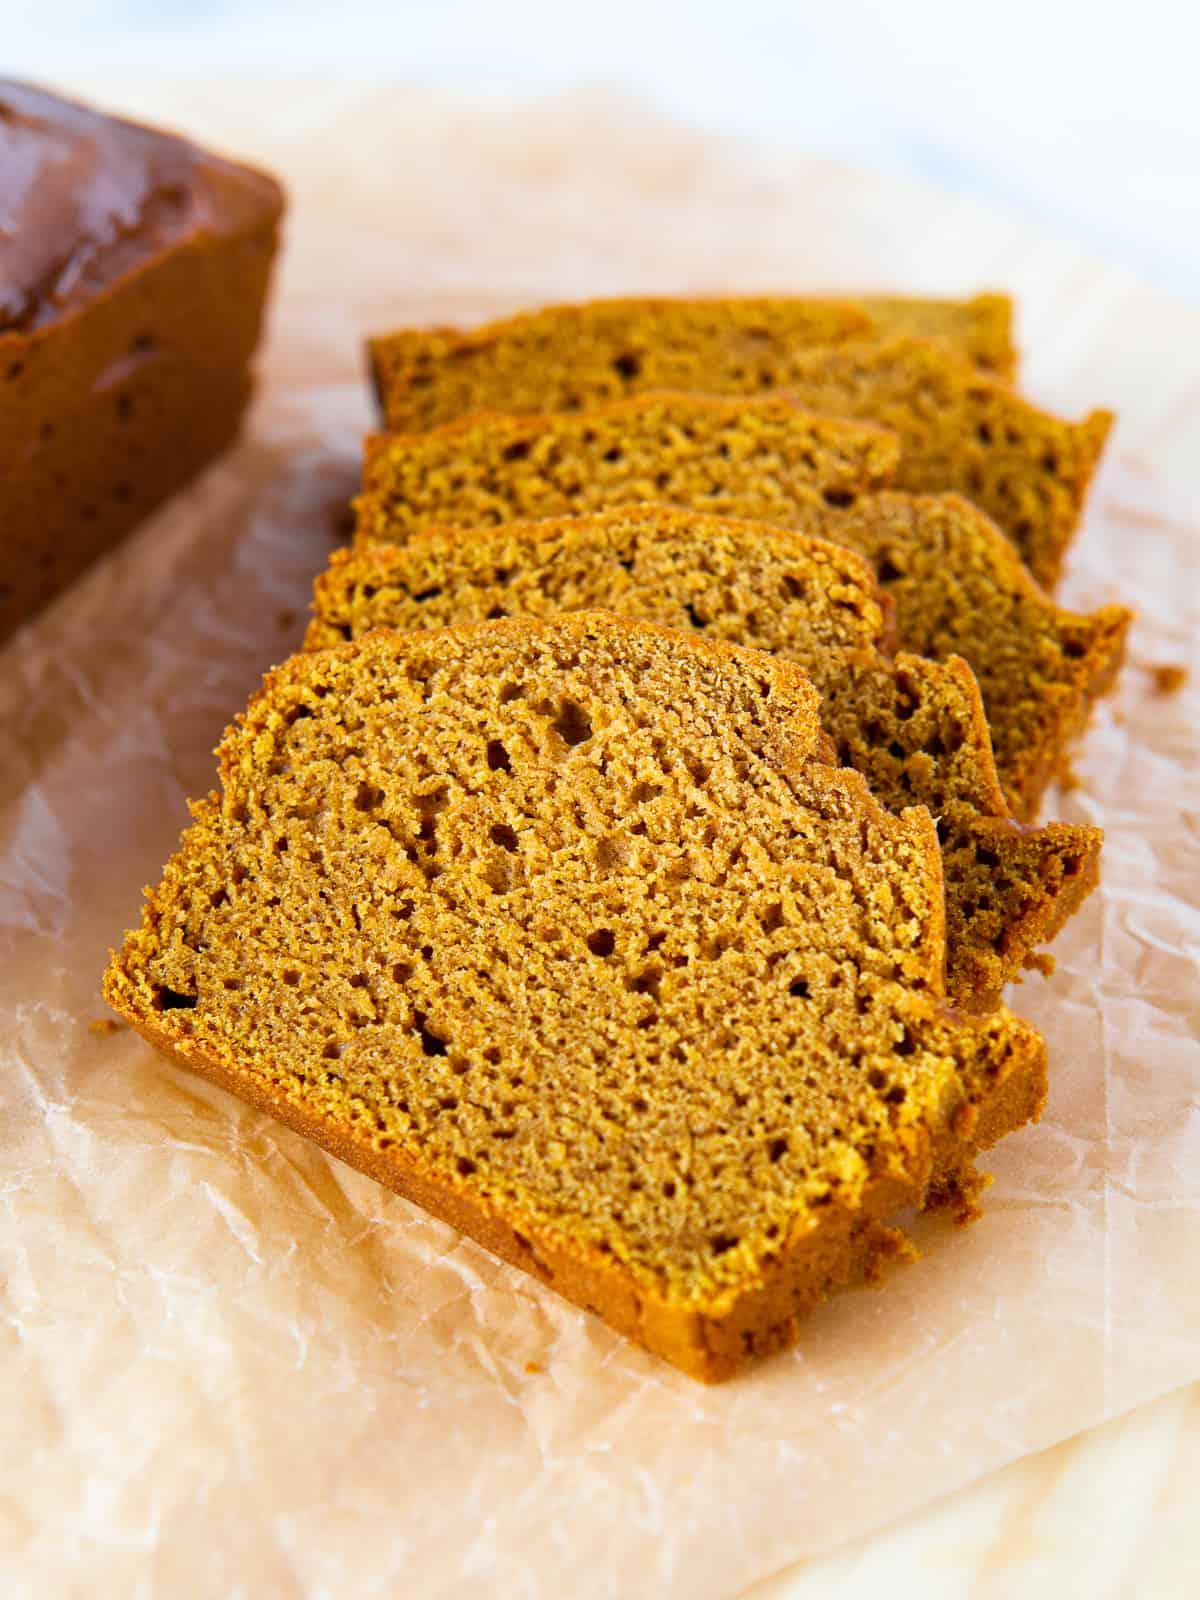 Sliced gluten-free pumpkin bread on a cutting board.